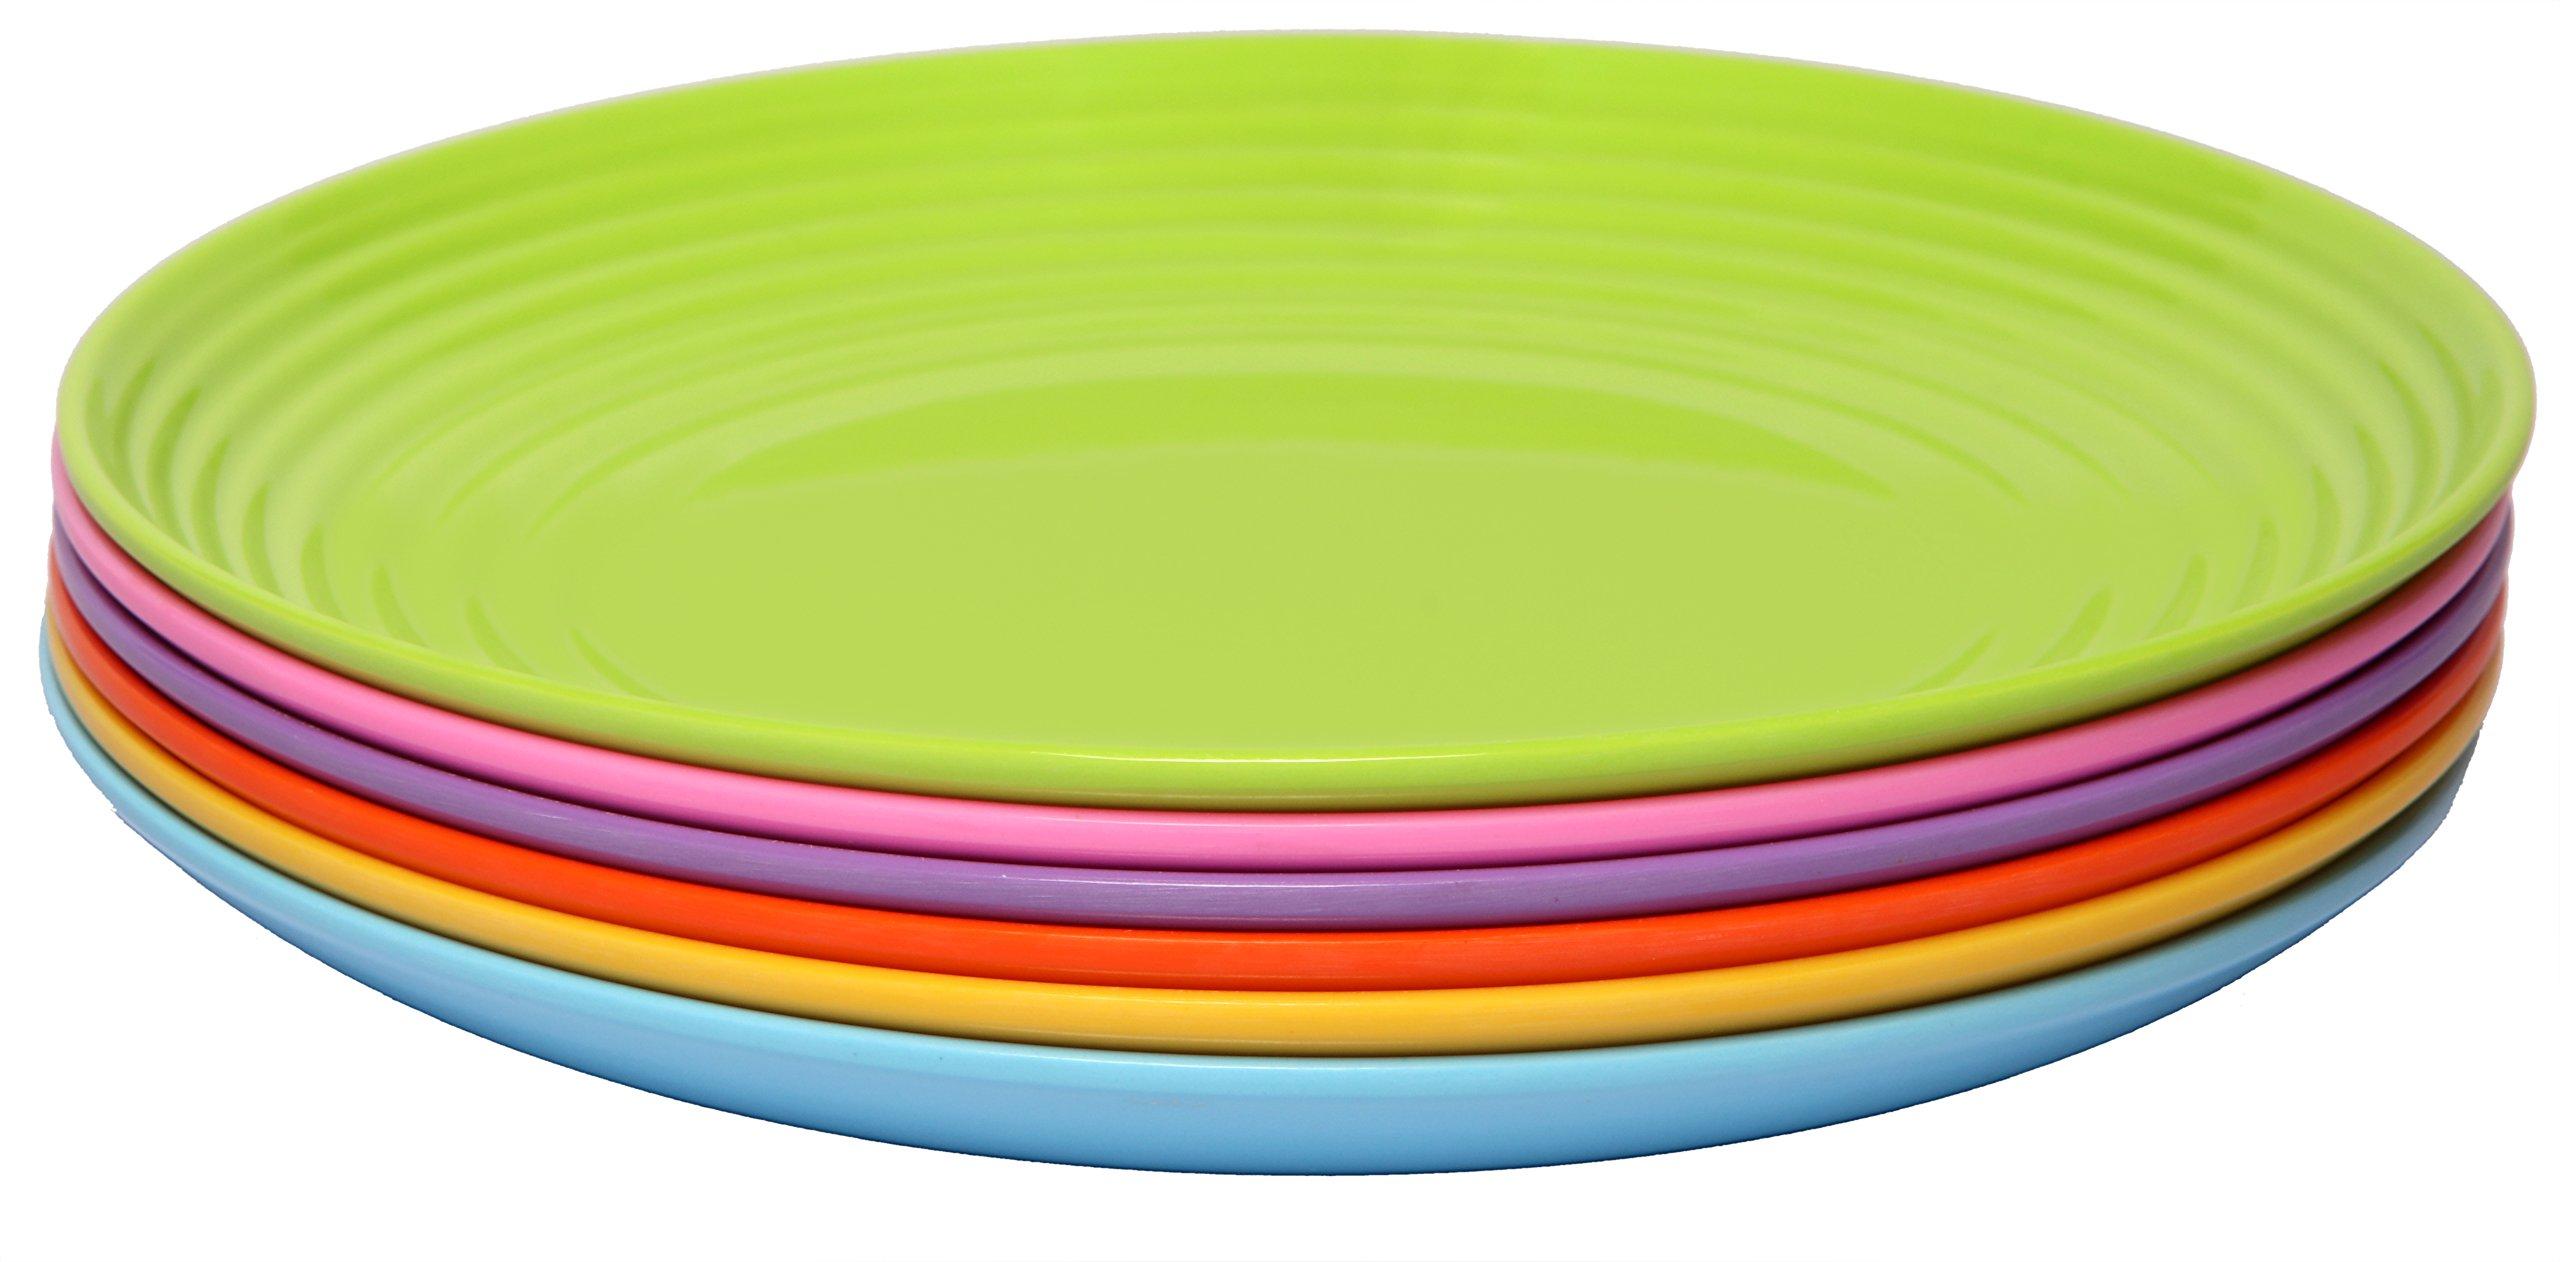 Melange 6-Piece Melamine Dinner Plate Set (Solids Collection) | Shatter-Proof and Chip-Resistant Melamine Dinner Plates | Color Multicolor by Melange